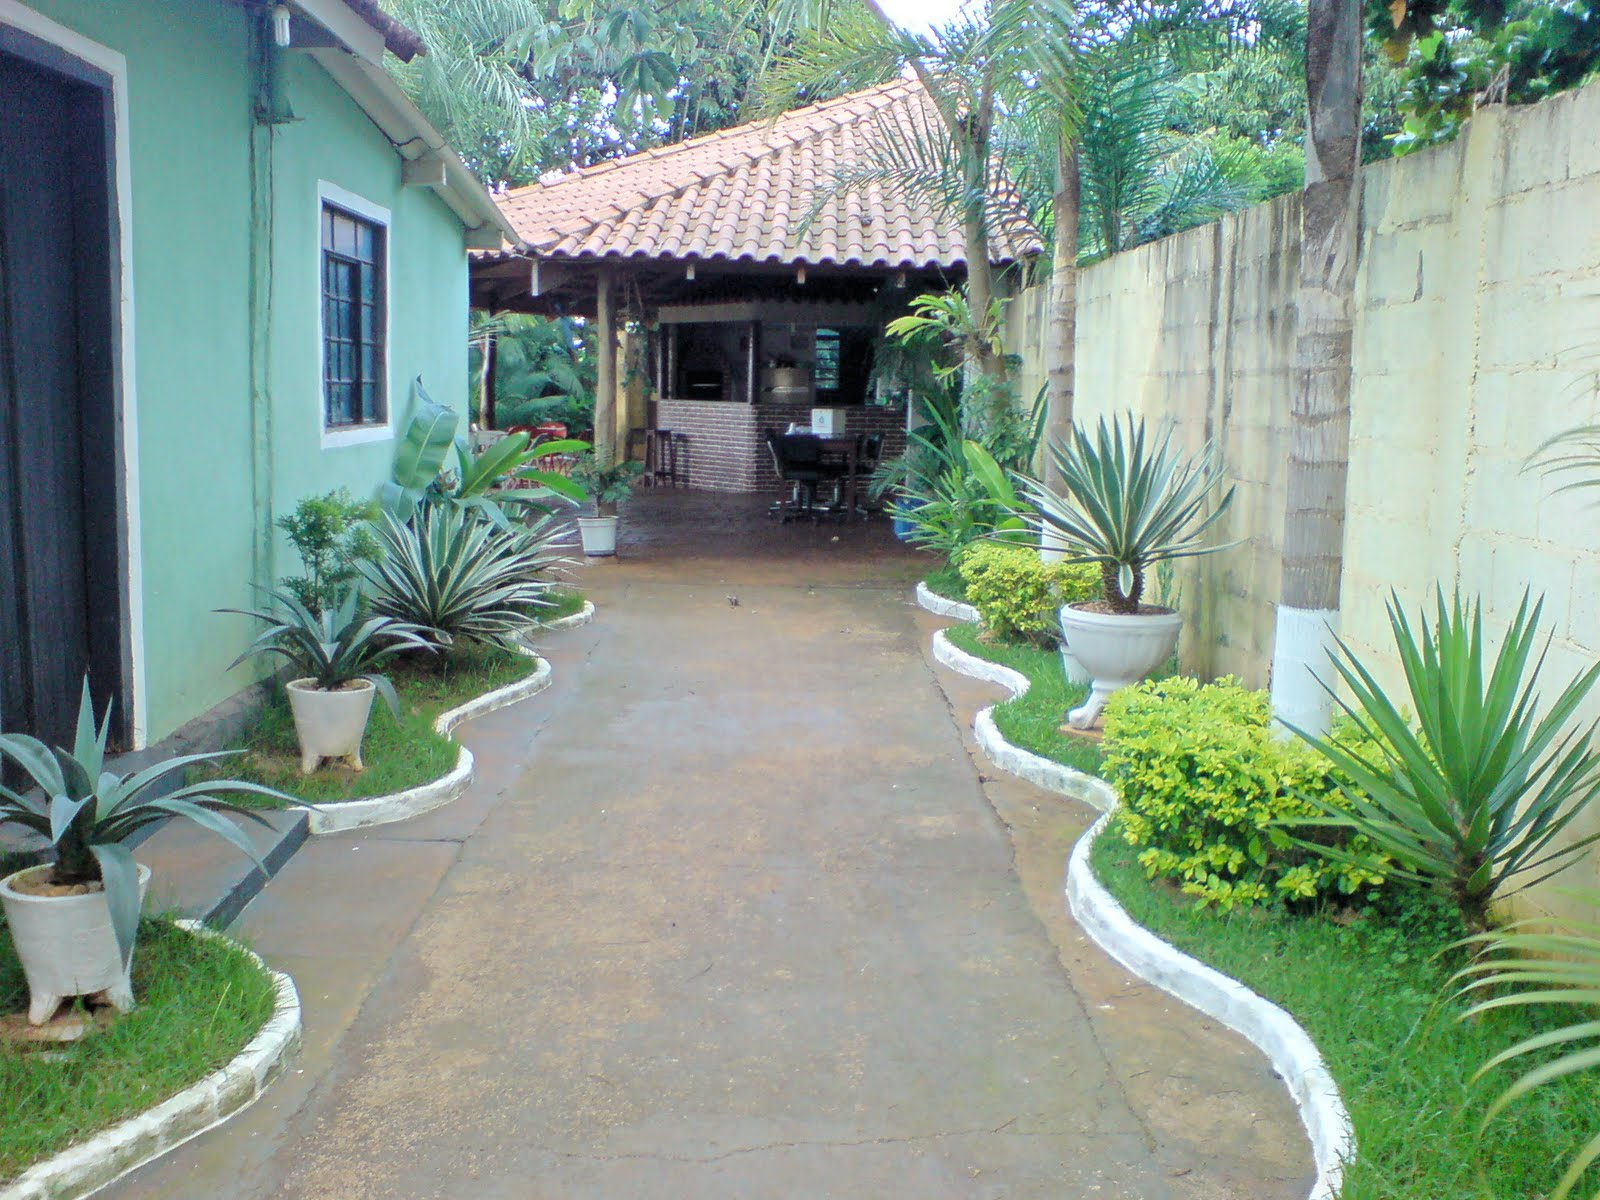 fotos jardins grama esmeralda : fotos jardins grama esmeralda ? Doitri.com